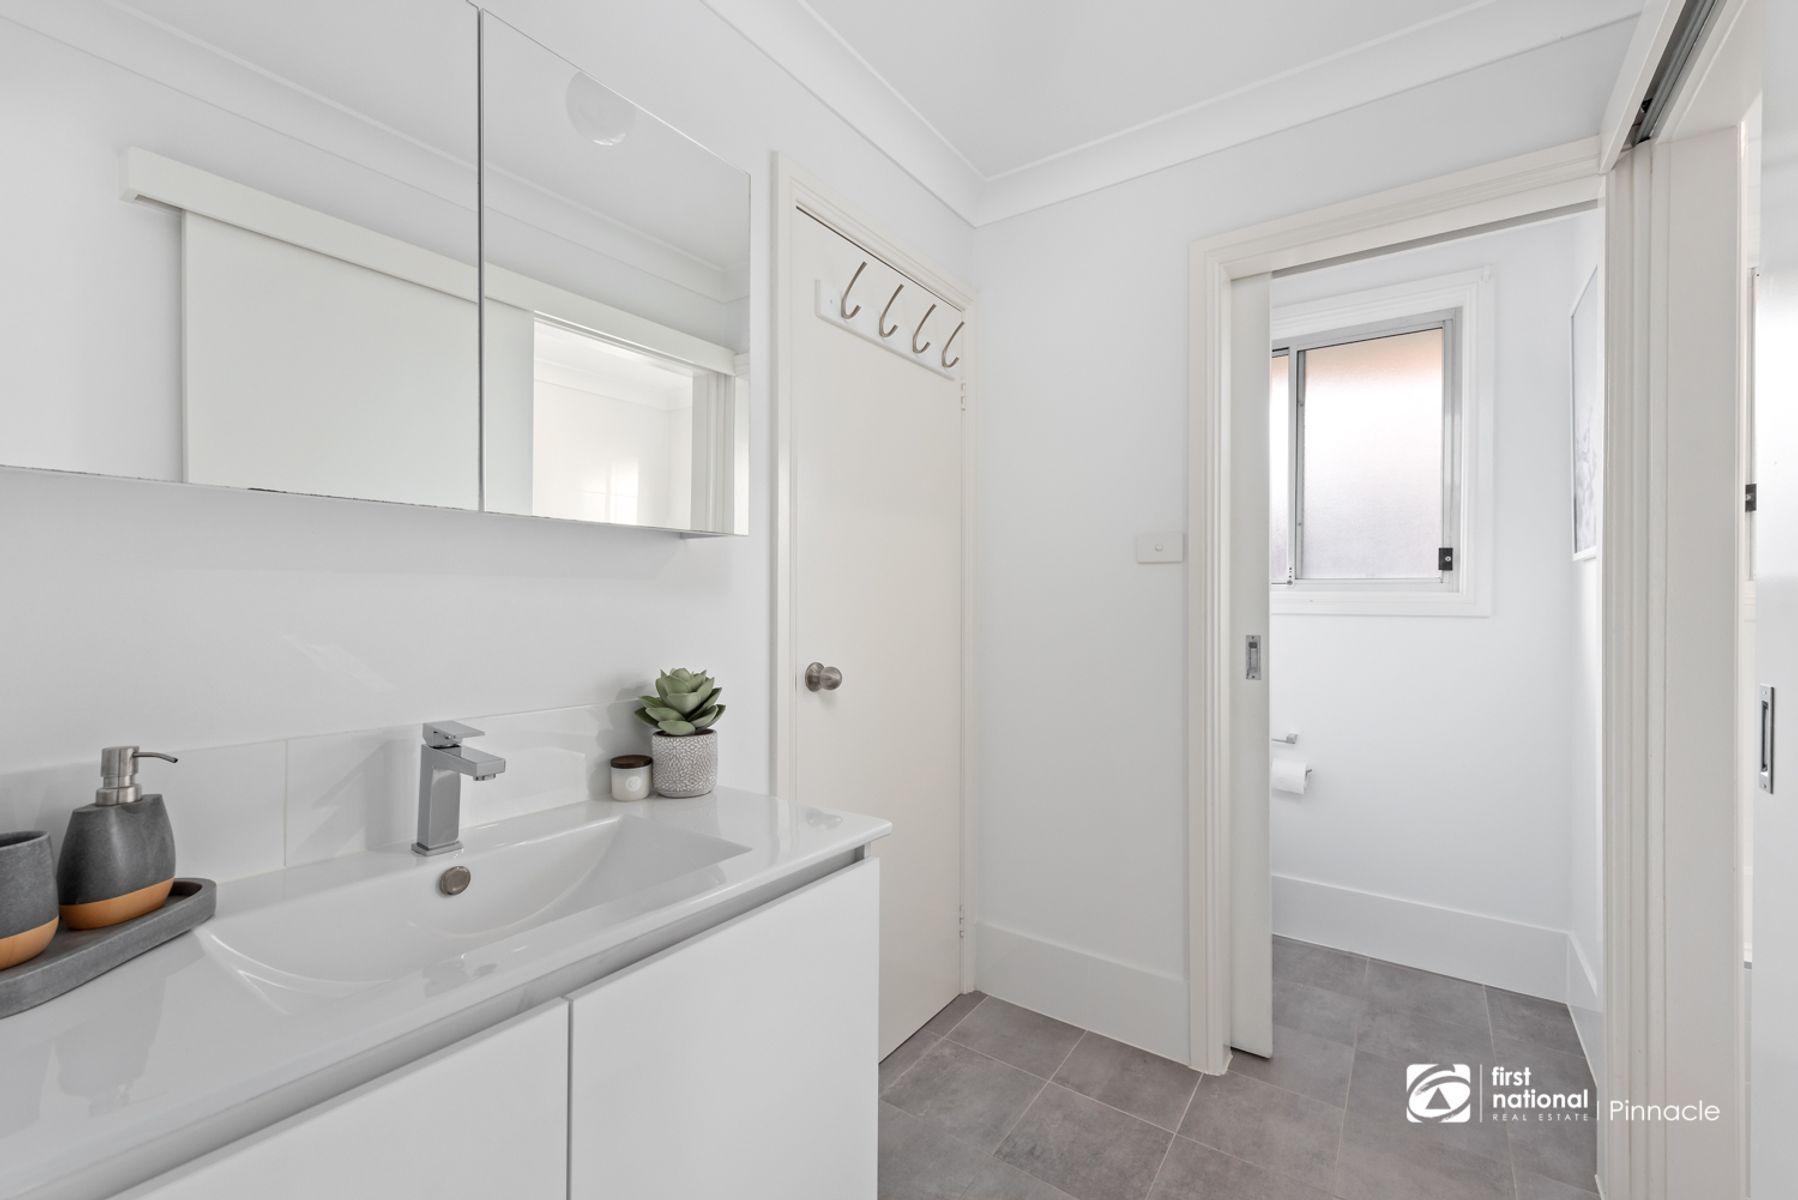 29 Peppercorn Avenue, Narellan, NSW 2567